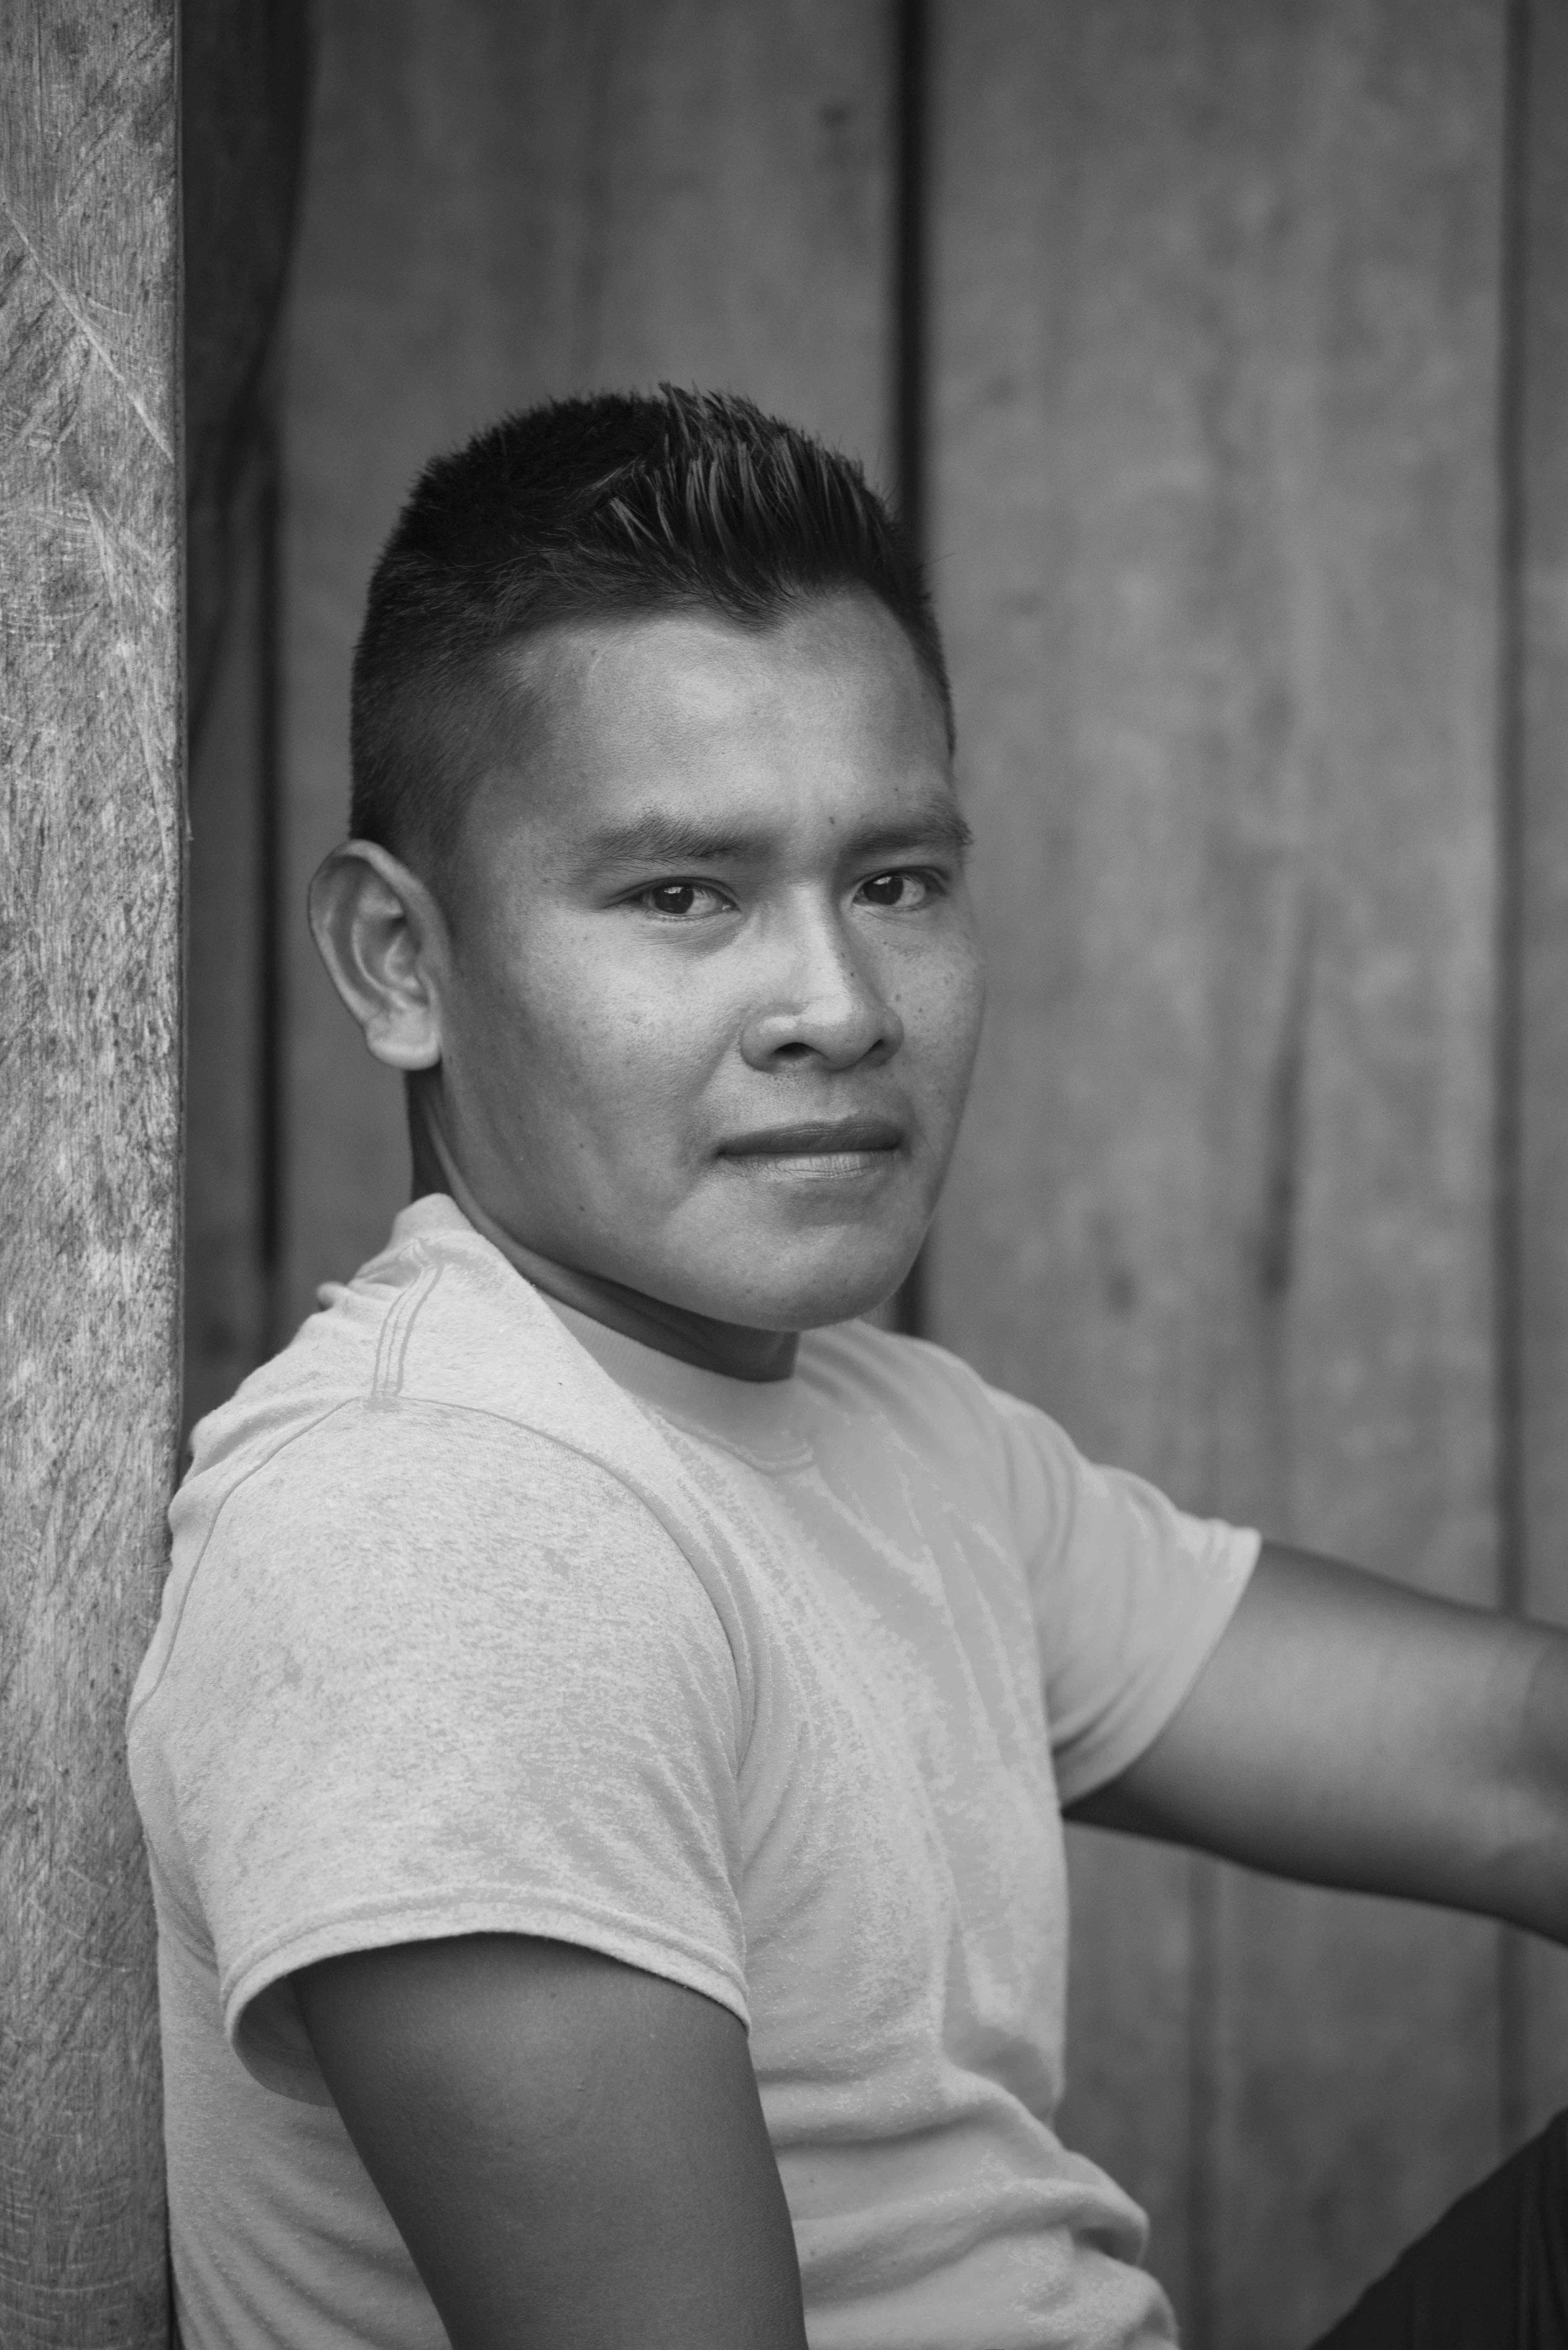 Adilson Payaguaje Payaguaje, Senior Solar Technician